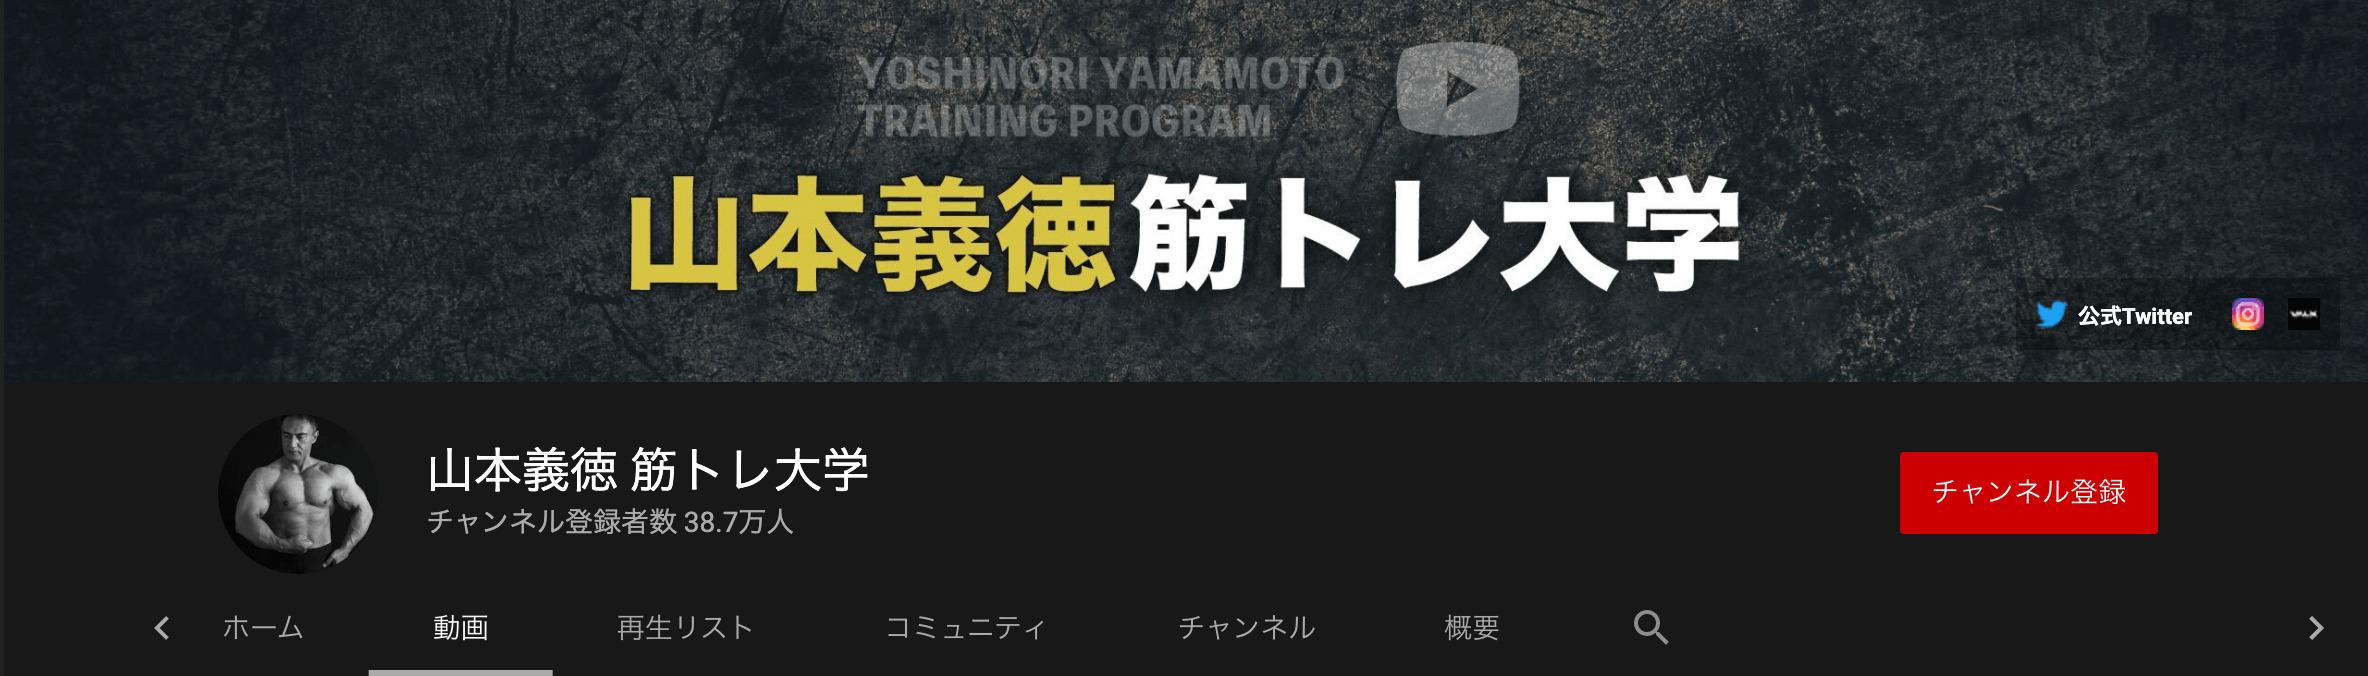 youtube_kintore_yosinoriyamamoto